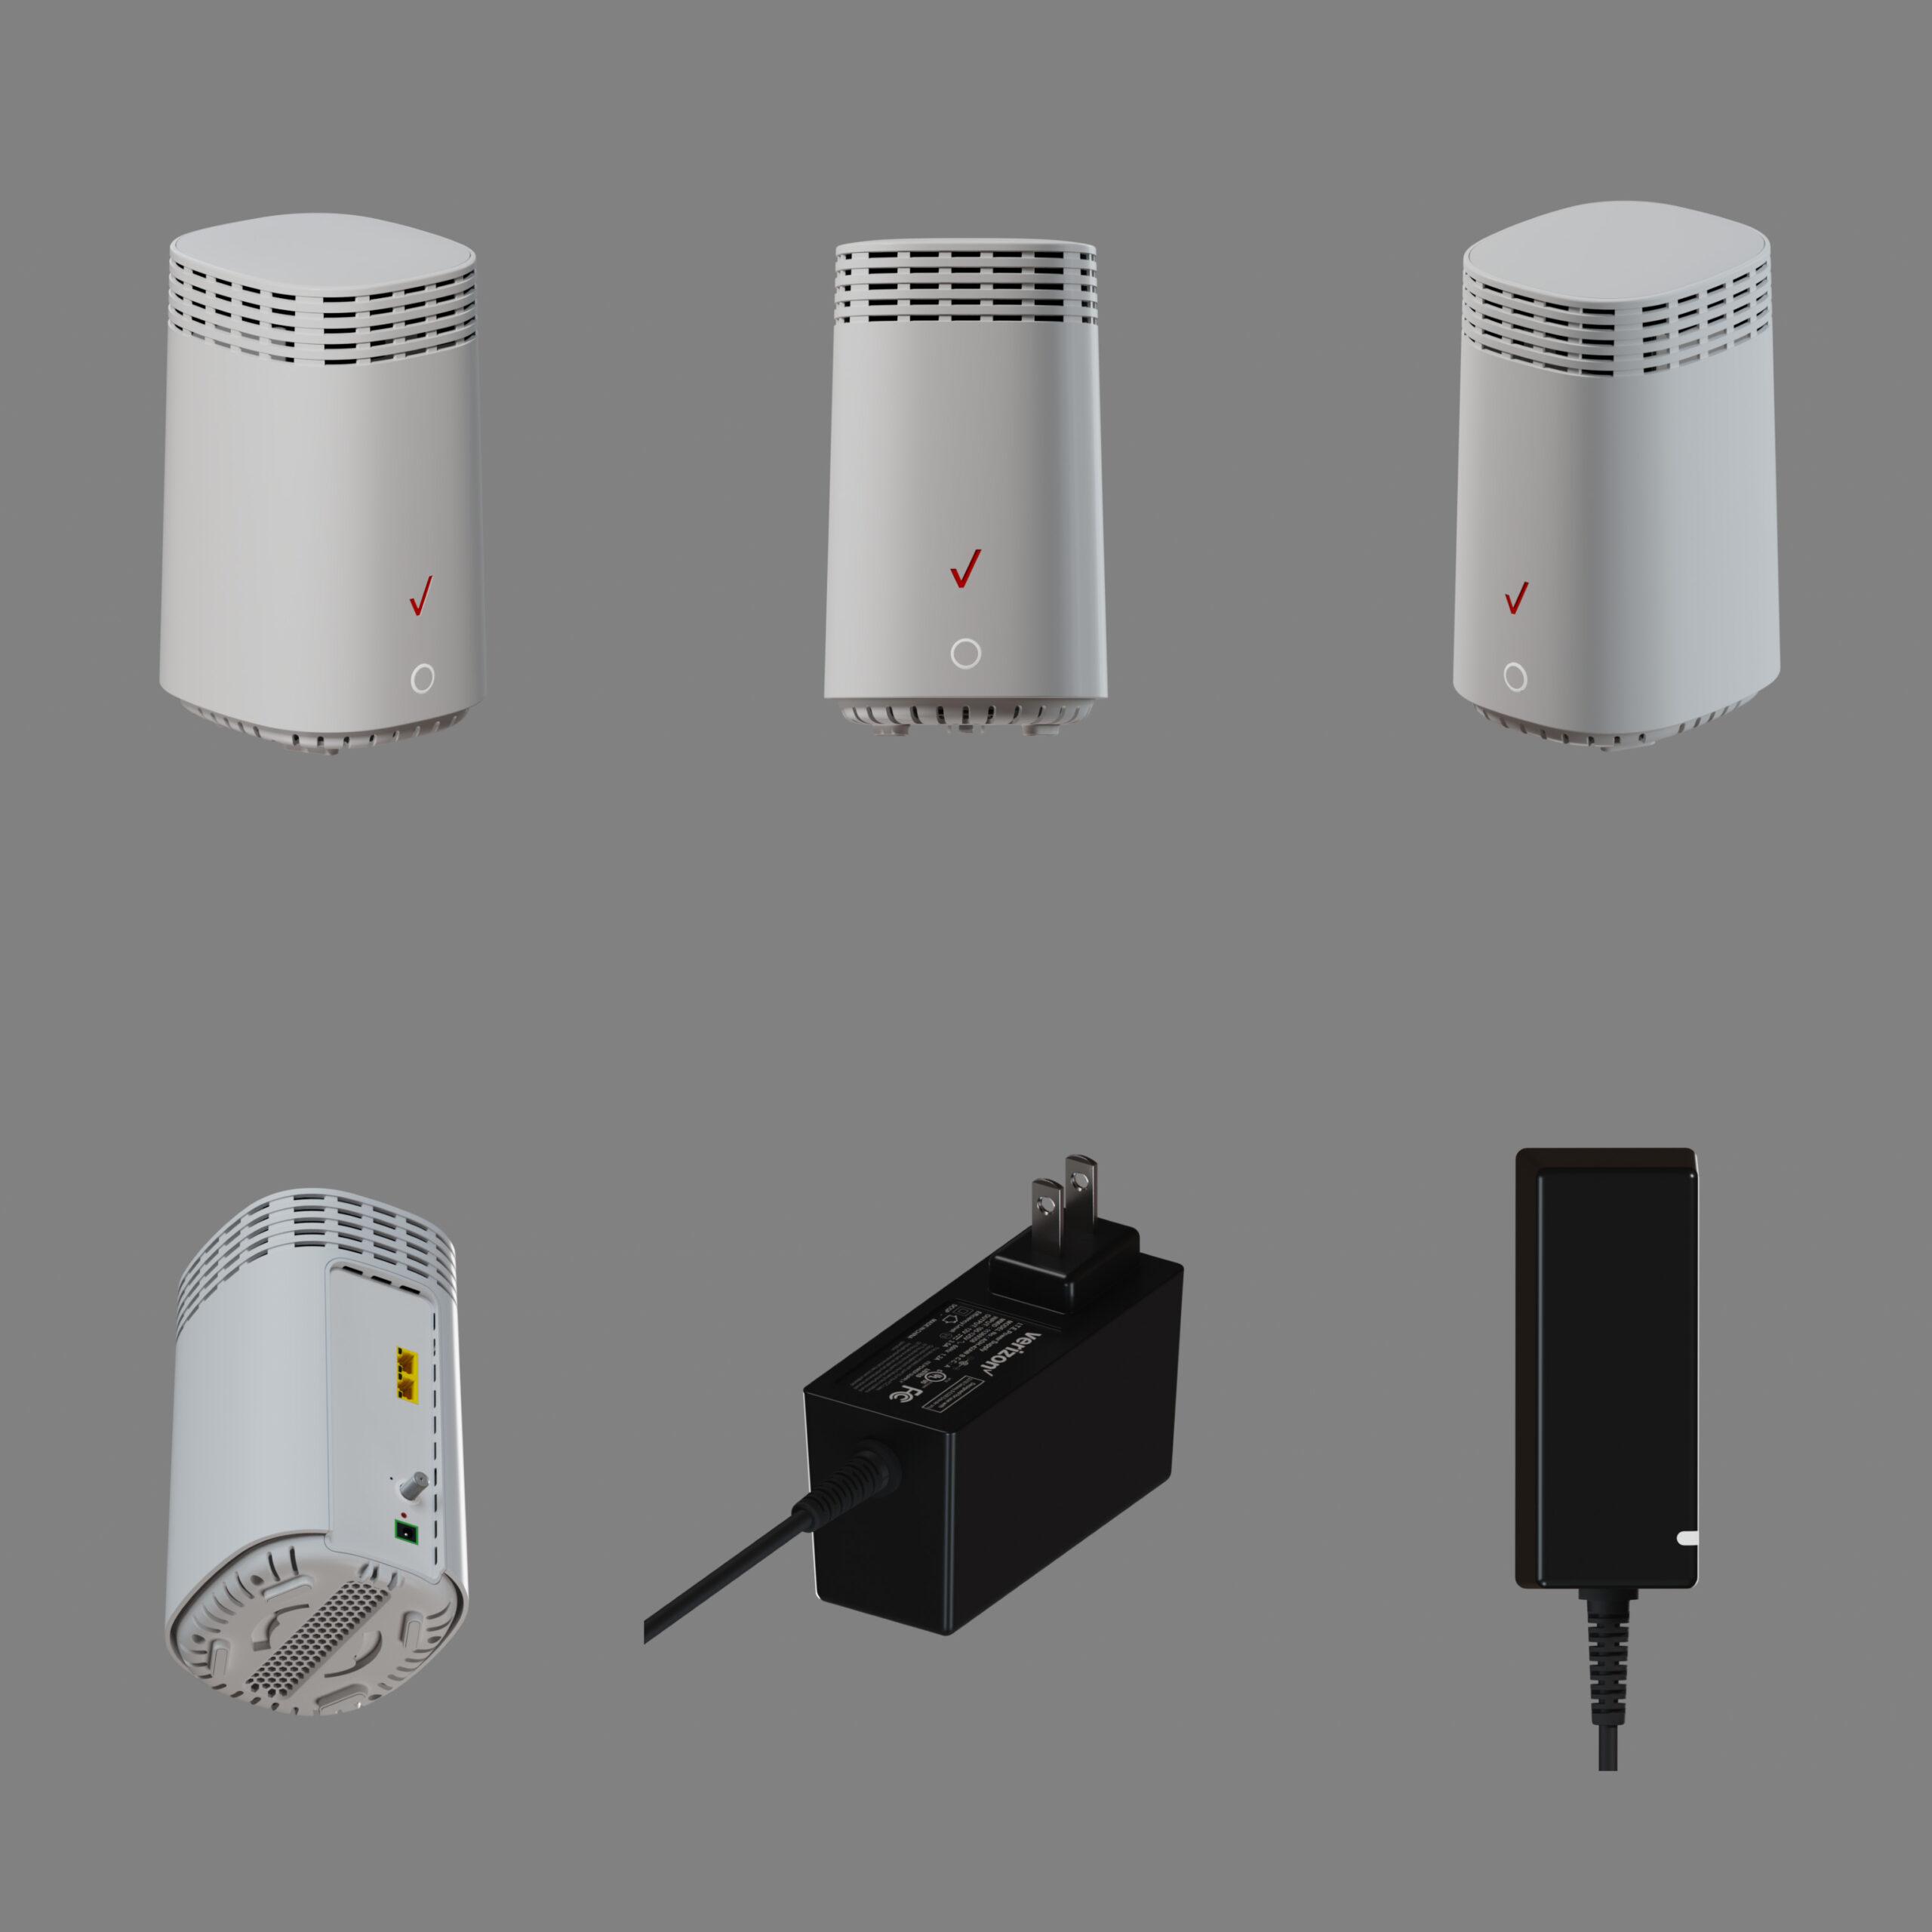 Verizon_router_v001